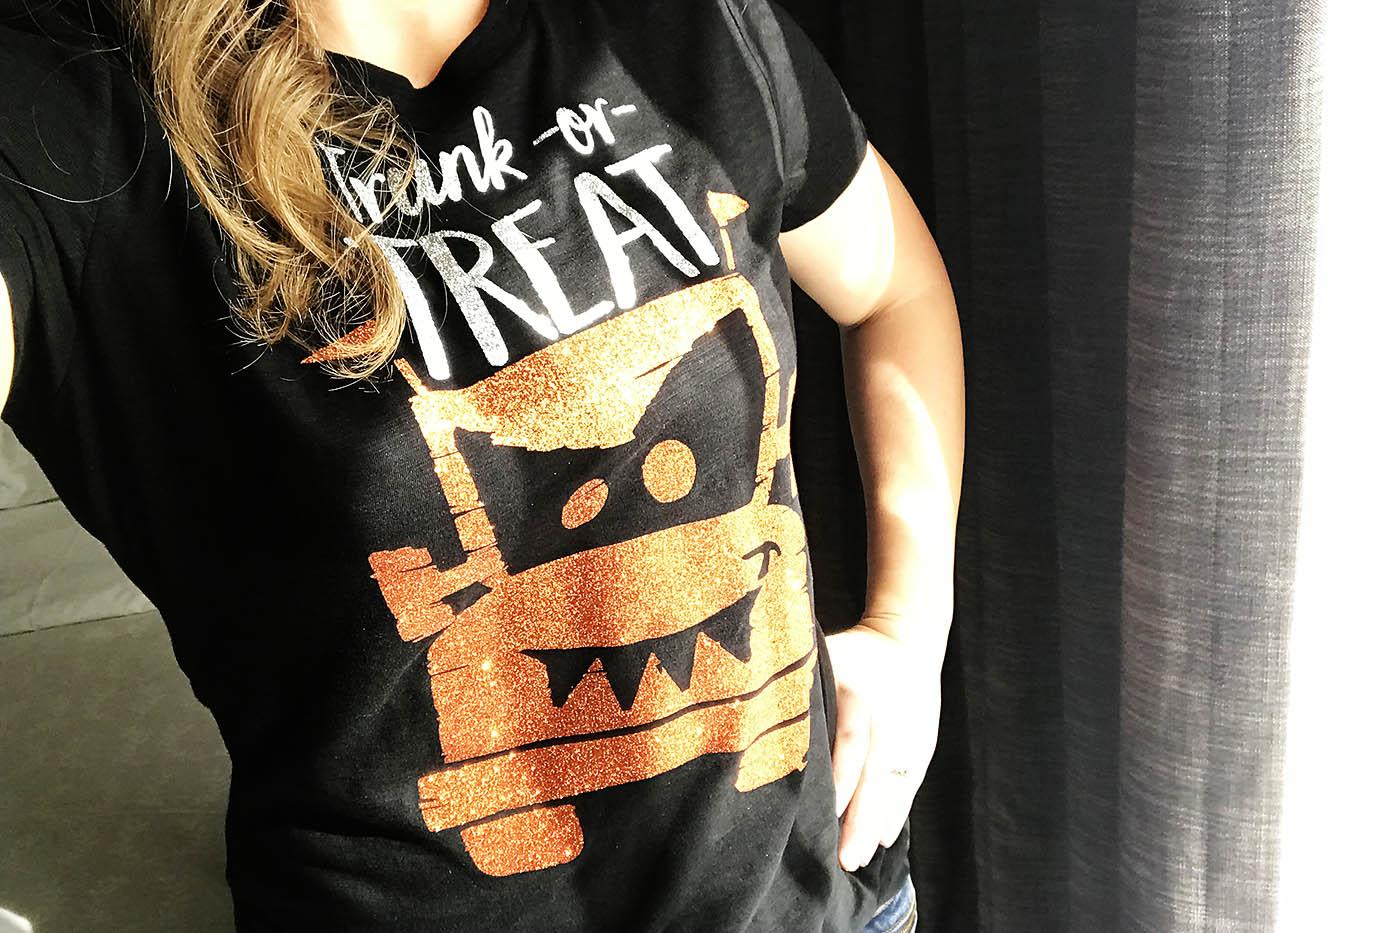 DIY Trunk or Treat shirts